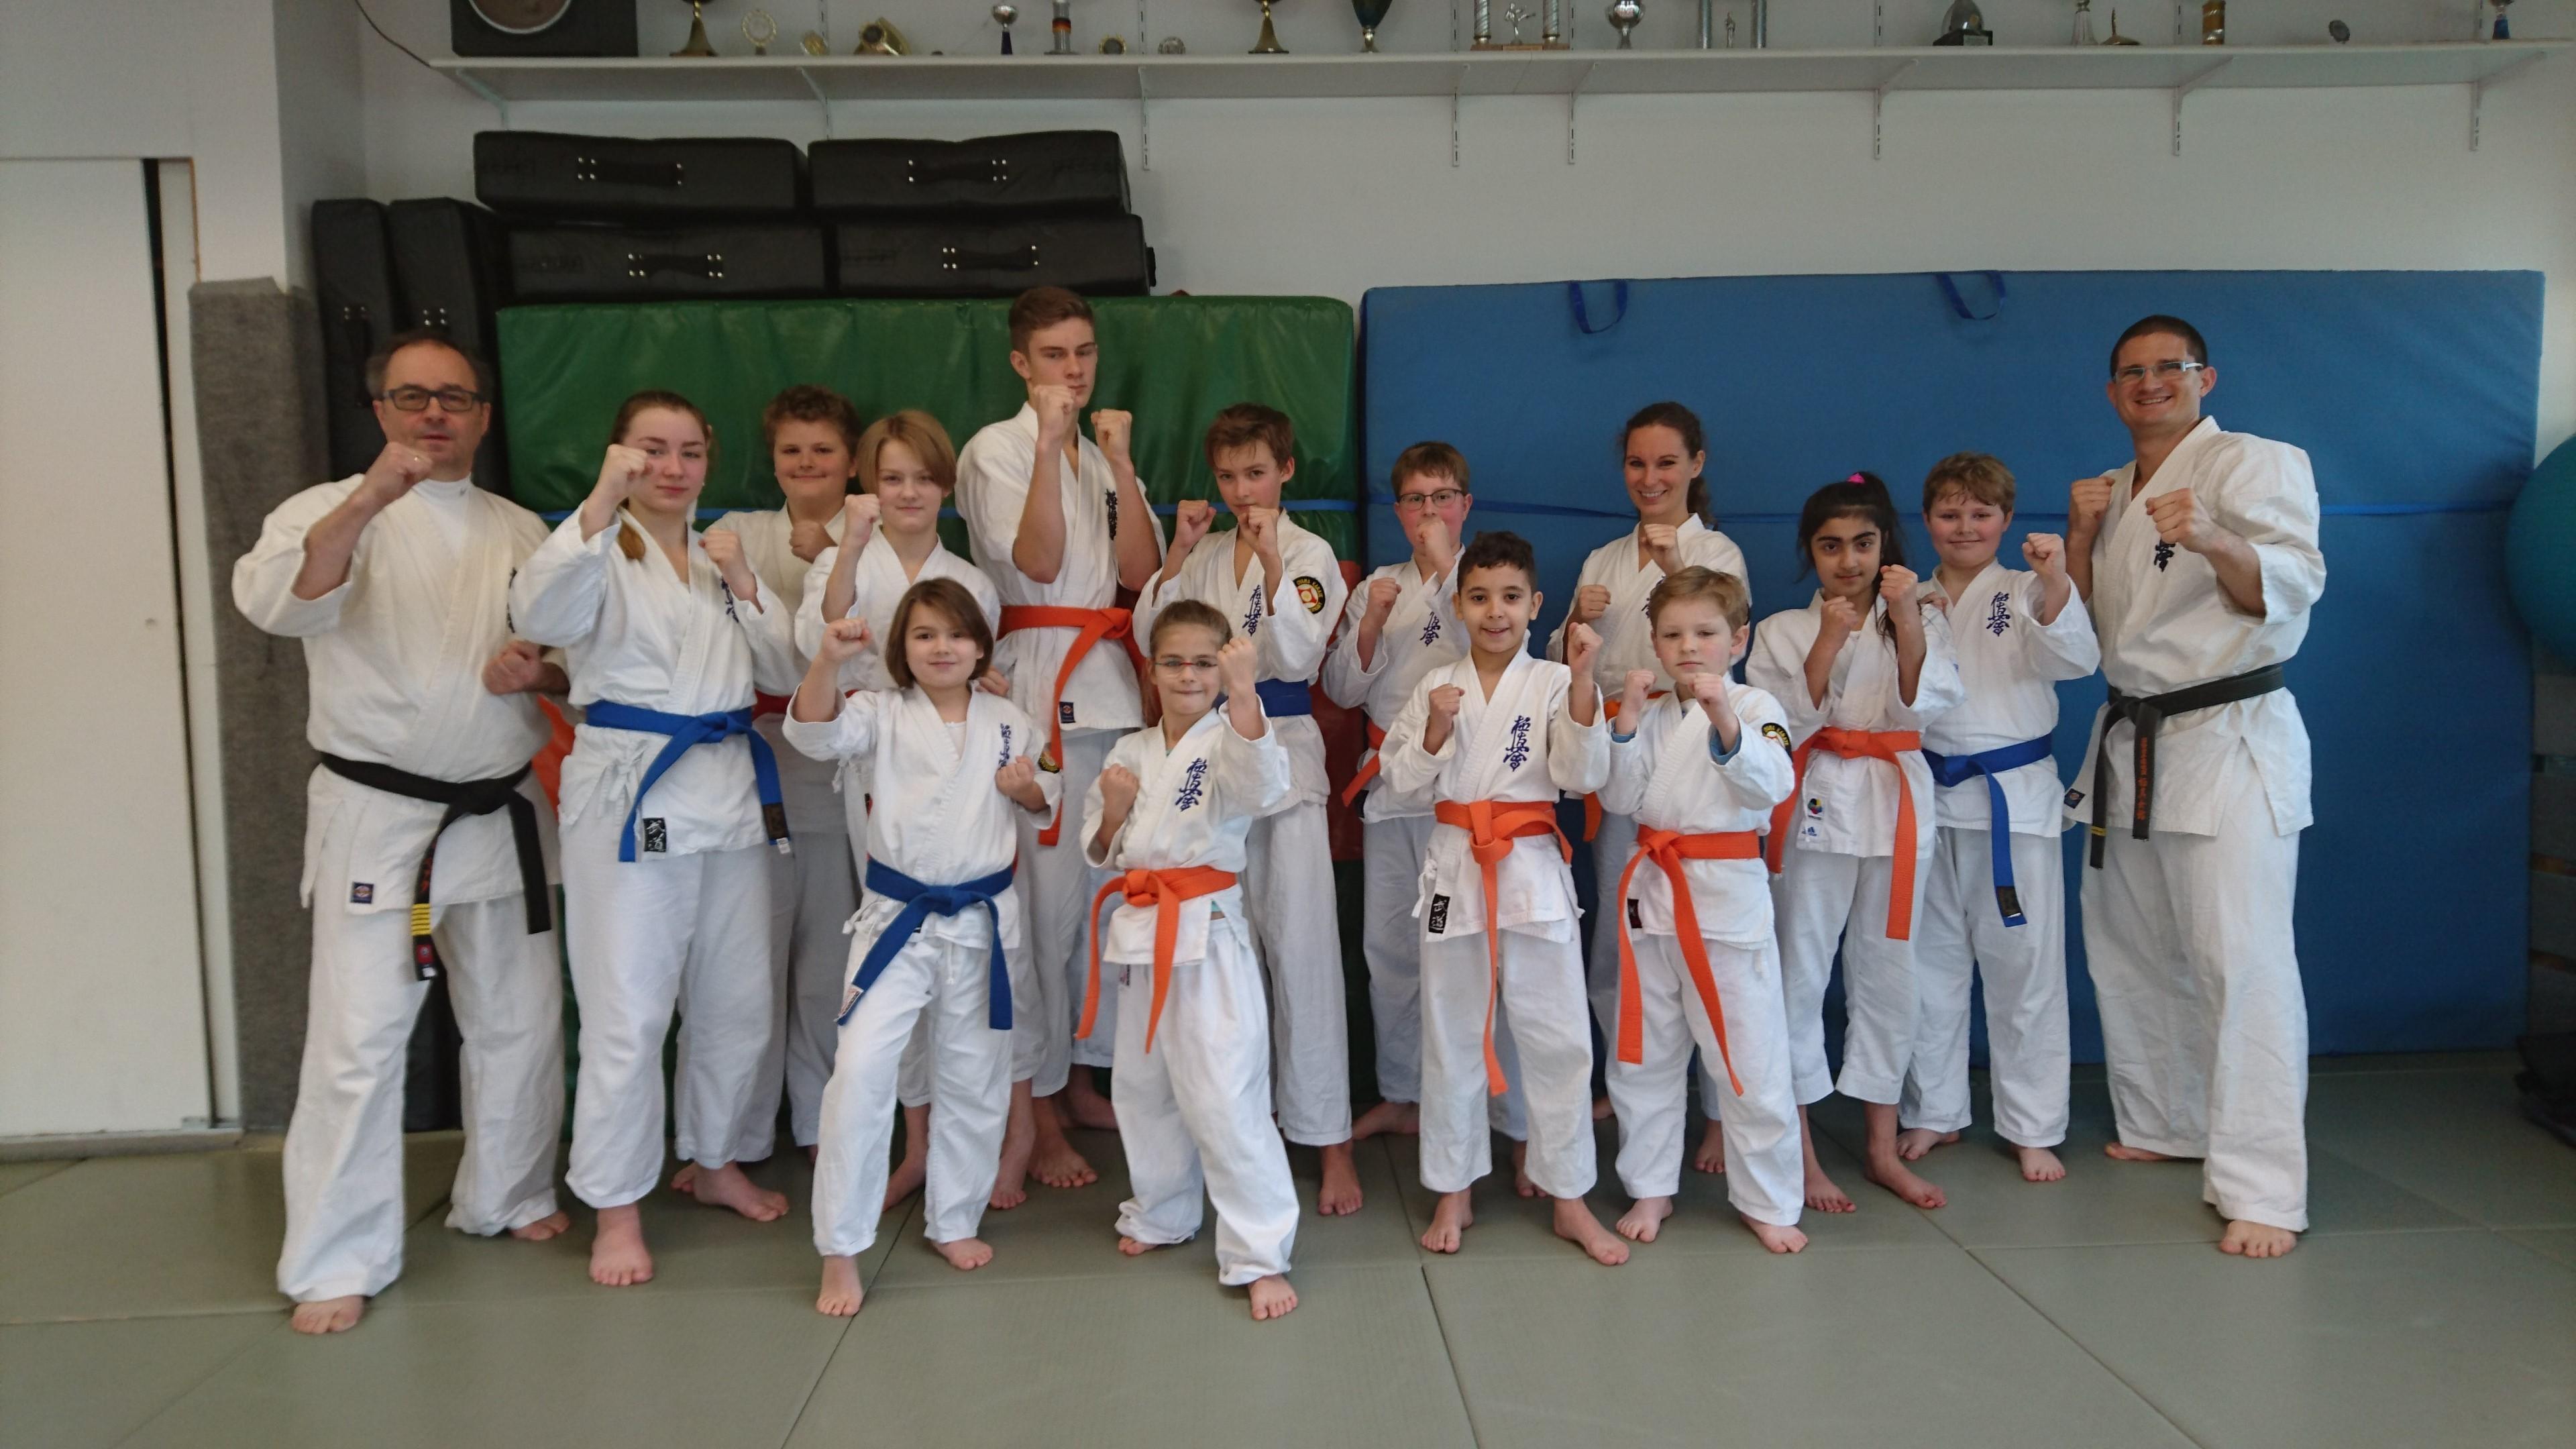 Karateprüfung im Dezember 2017